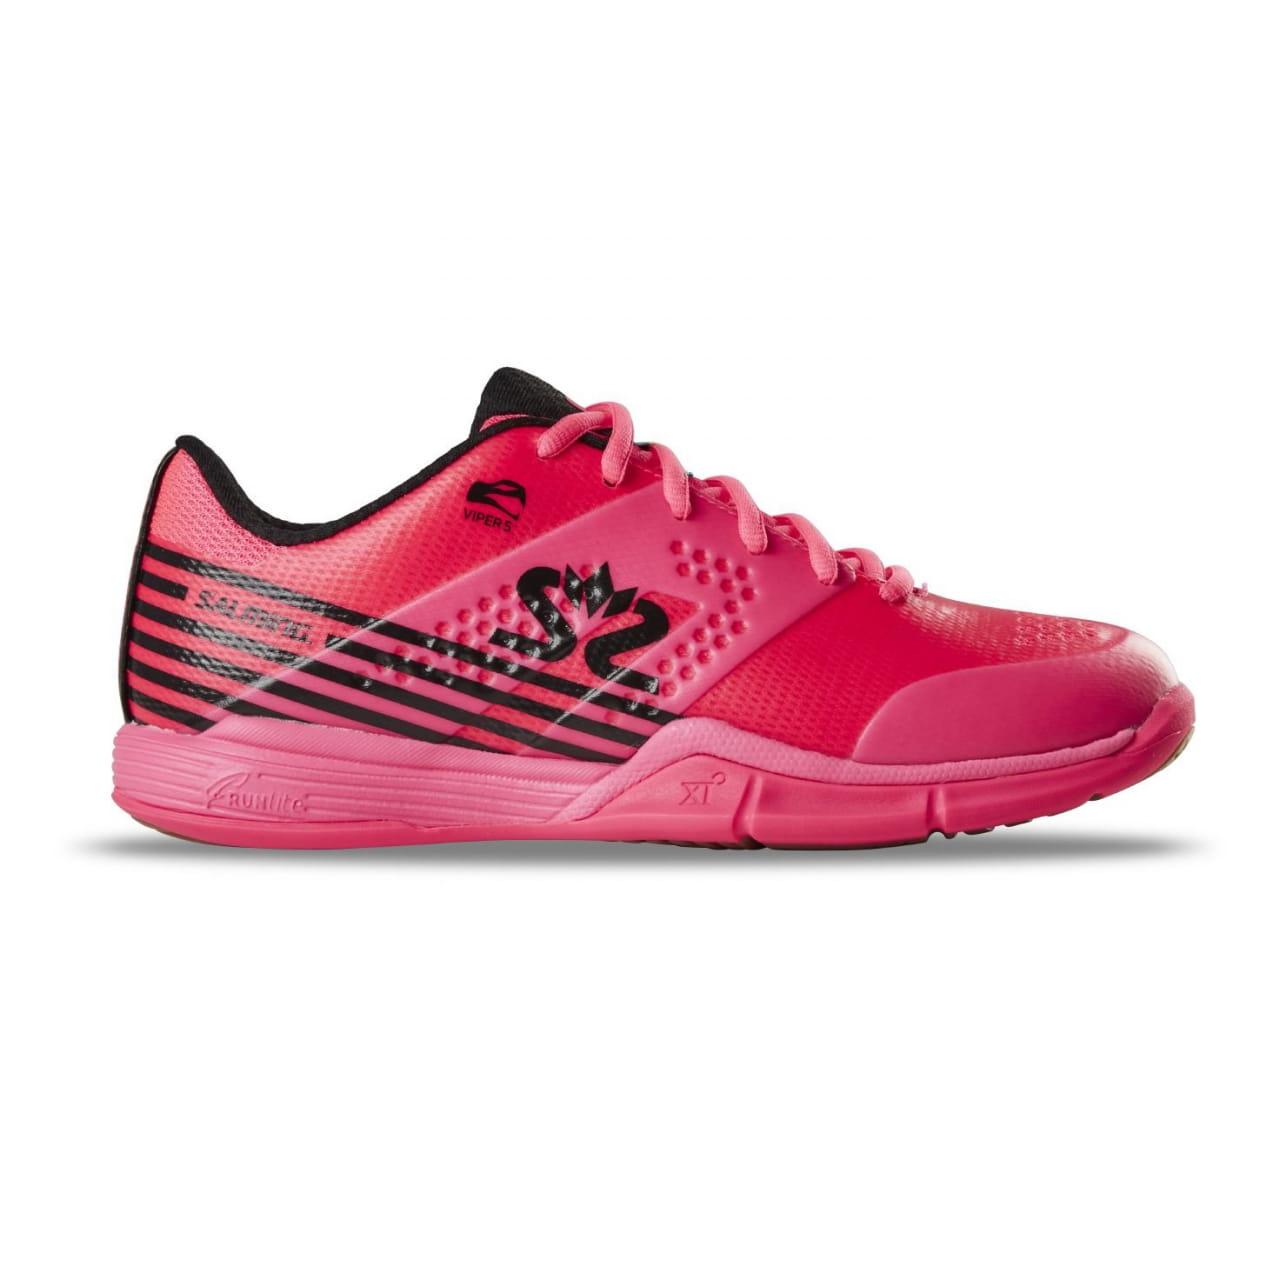 Halová obuv Salming Viper 5 Shoe Women Pink/Black